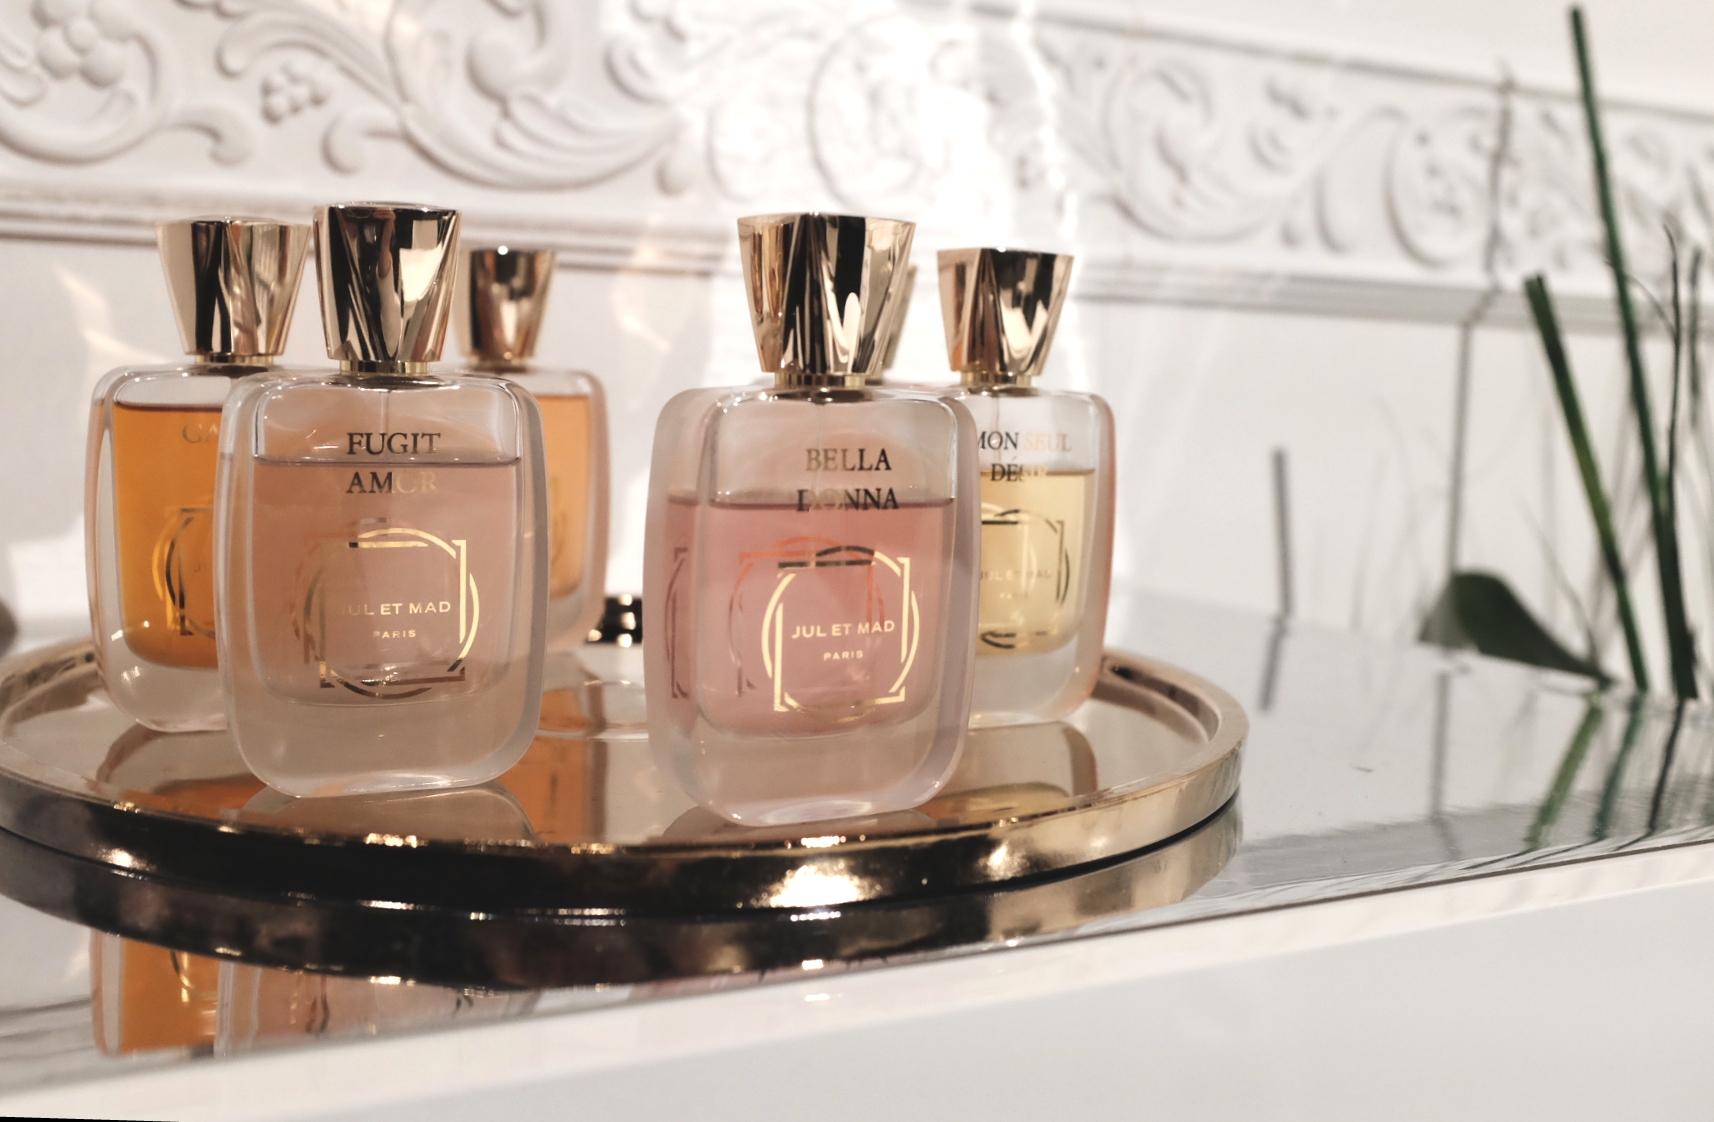 новые ароматы Jul et Mad